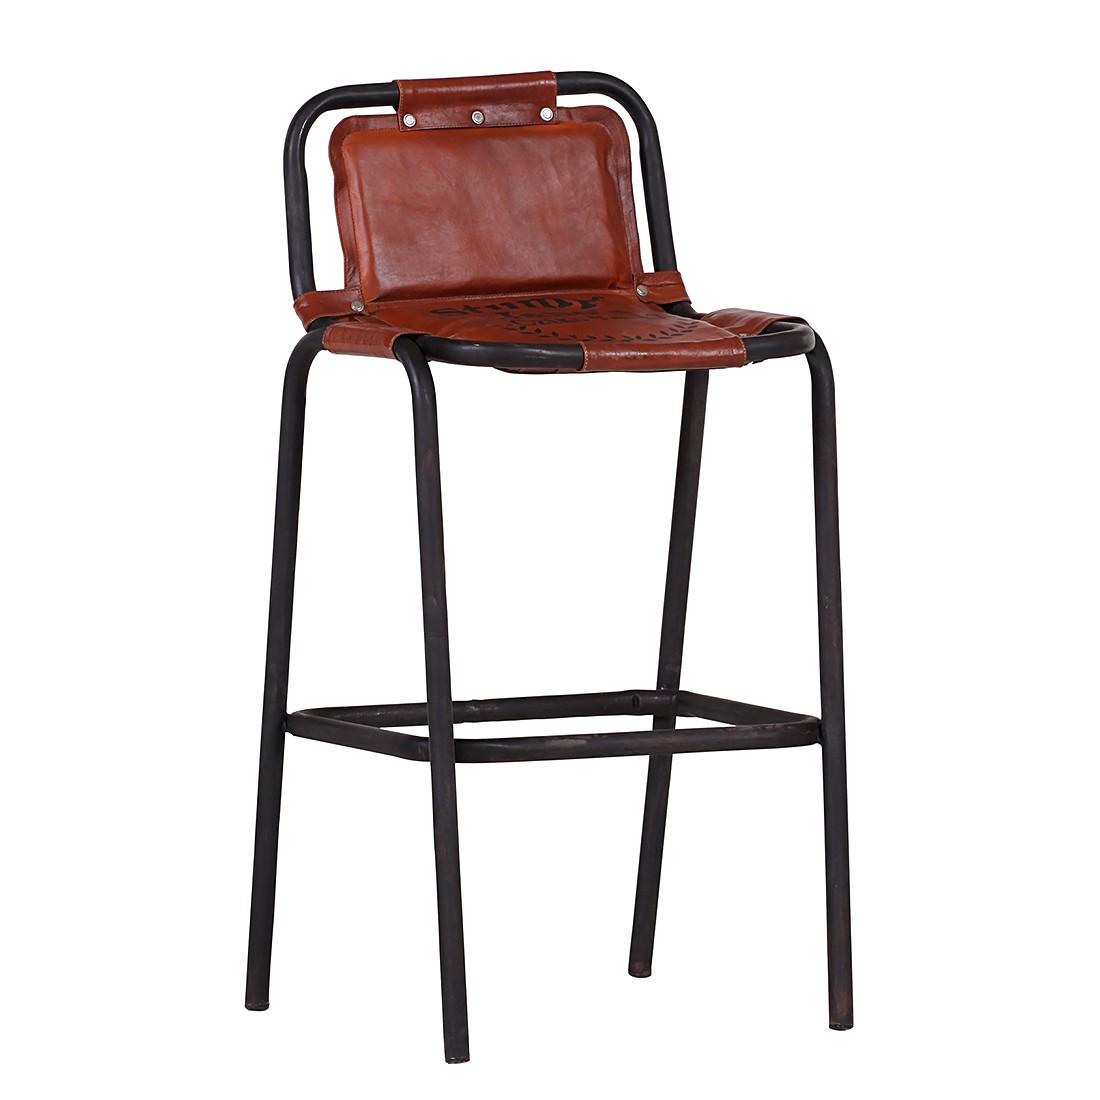 Barhocker Jano – Leder – Braun, furnlab kaufen